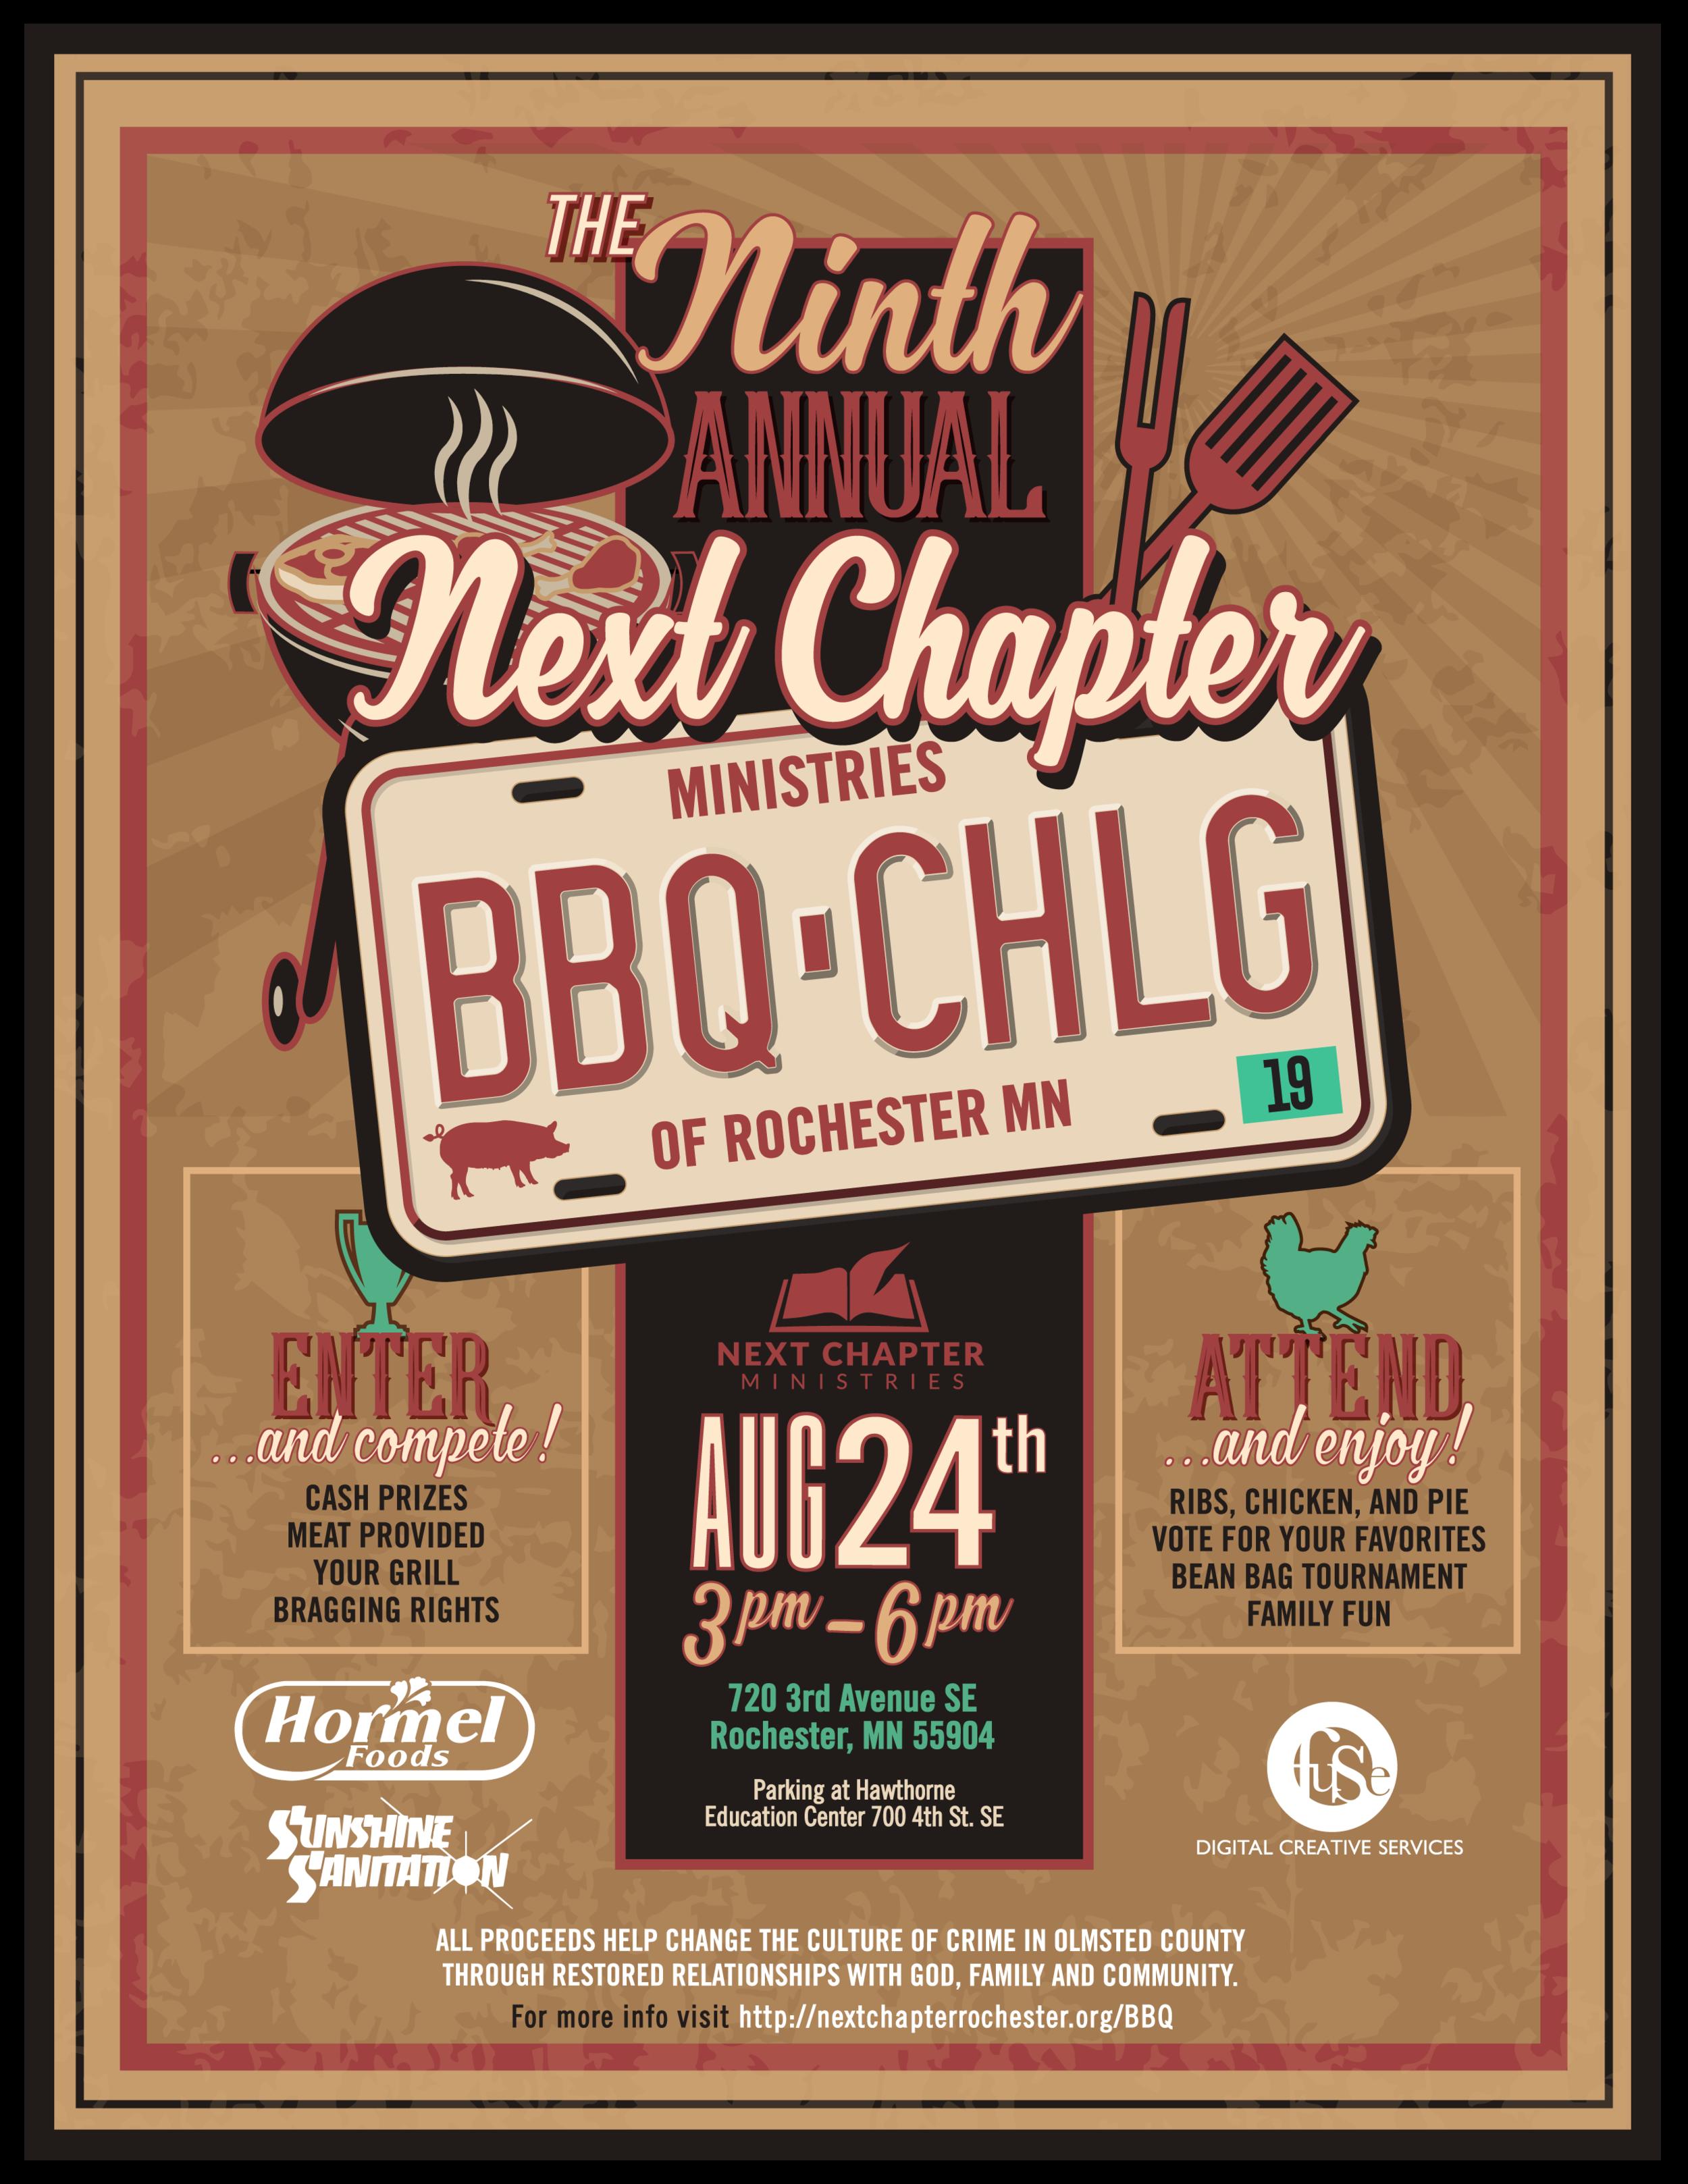 next-chapter-ministries-bbq-challenge-2019